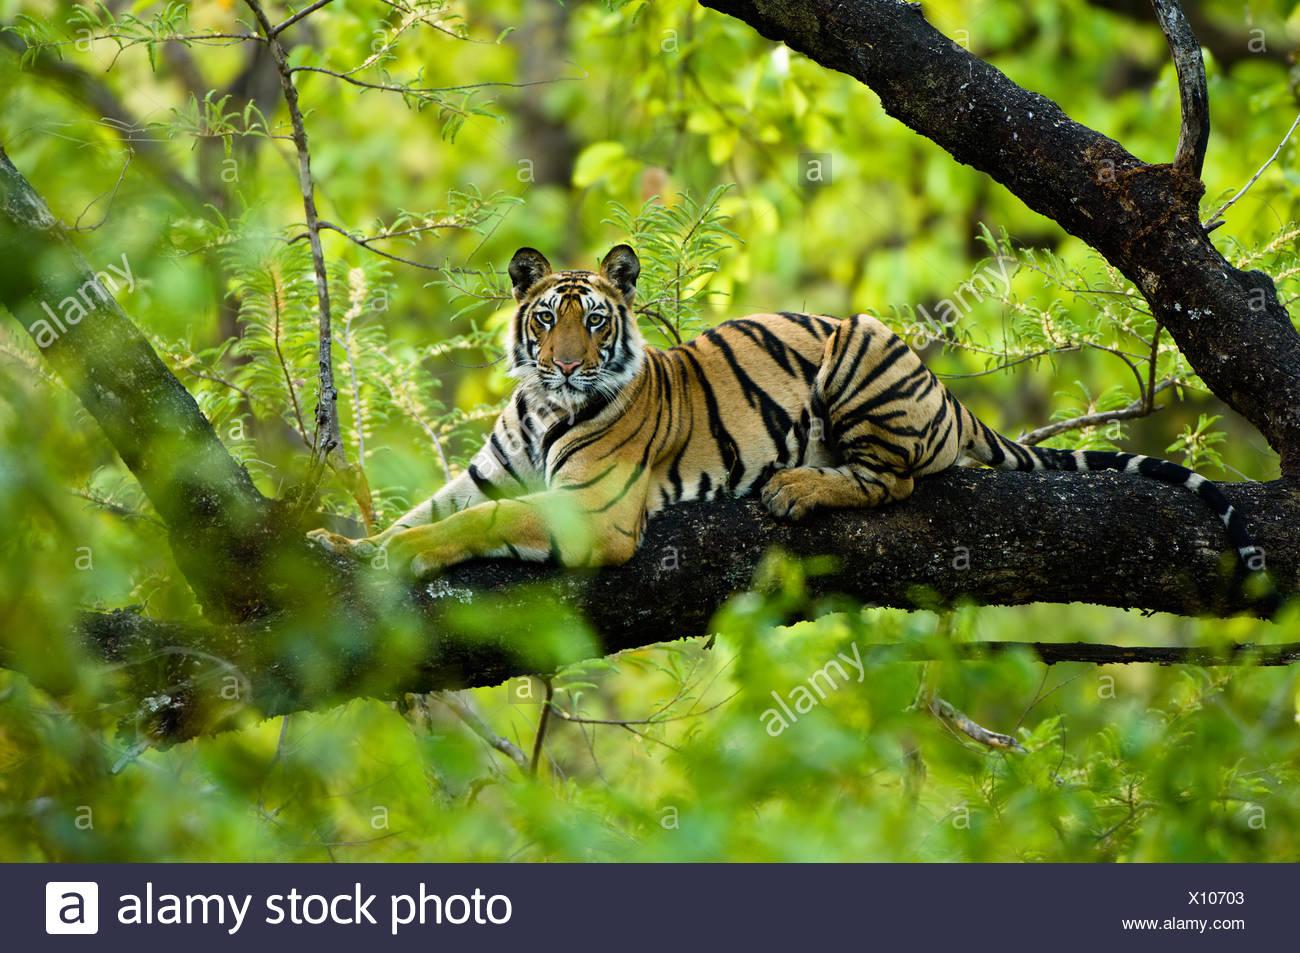 Adolescent male Bengal Tiger (around 15 months) resting up a tree. Bandhavgarh NP, Madhya Pradesh, India. - Stock Image